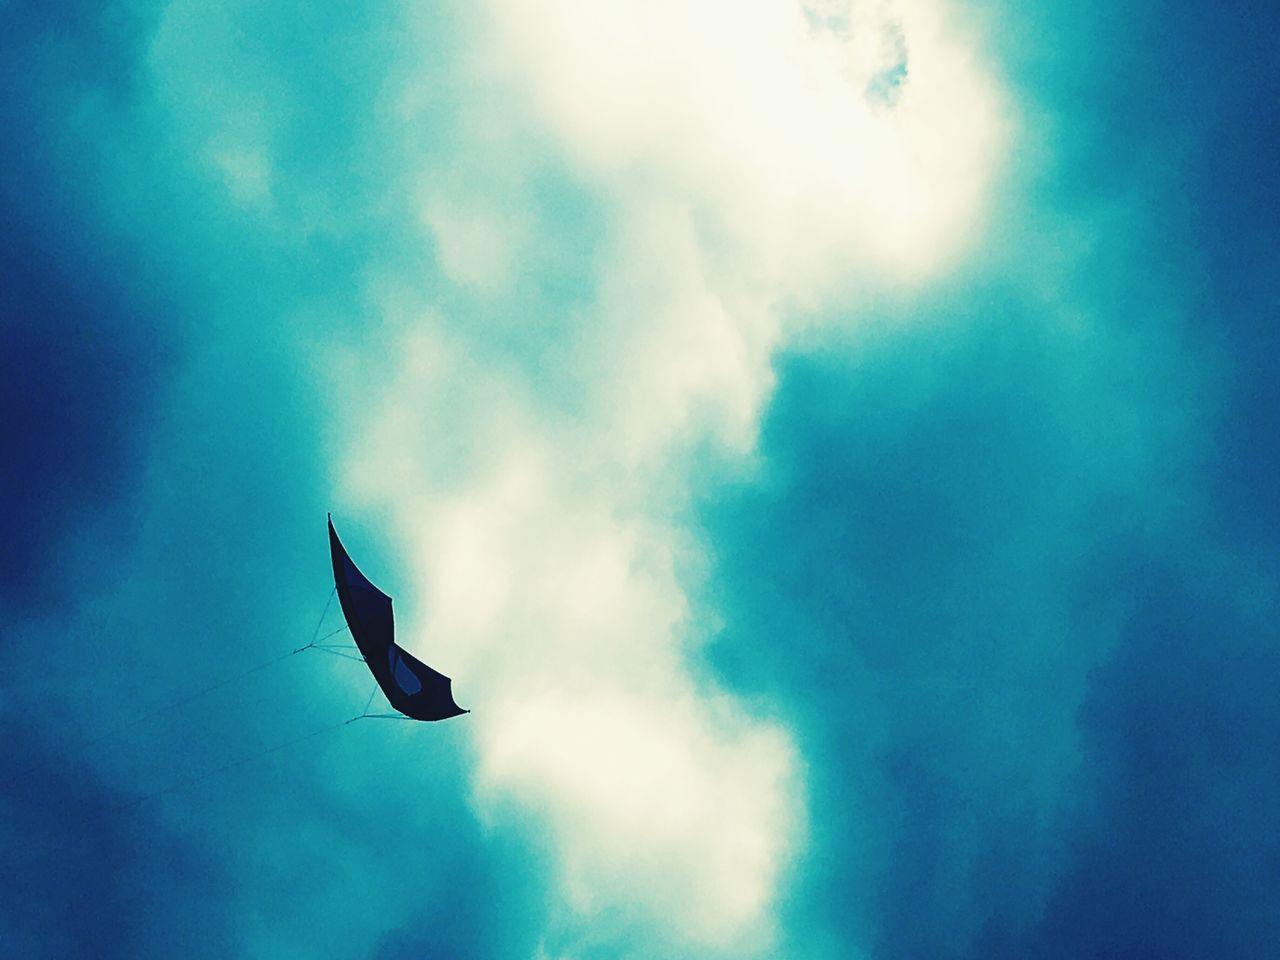 Soft Blue Sky Kite Kitesurfing Amaturephotography Power In Nature Natural Filters Lush LONDON❤ Hampstead Heath